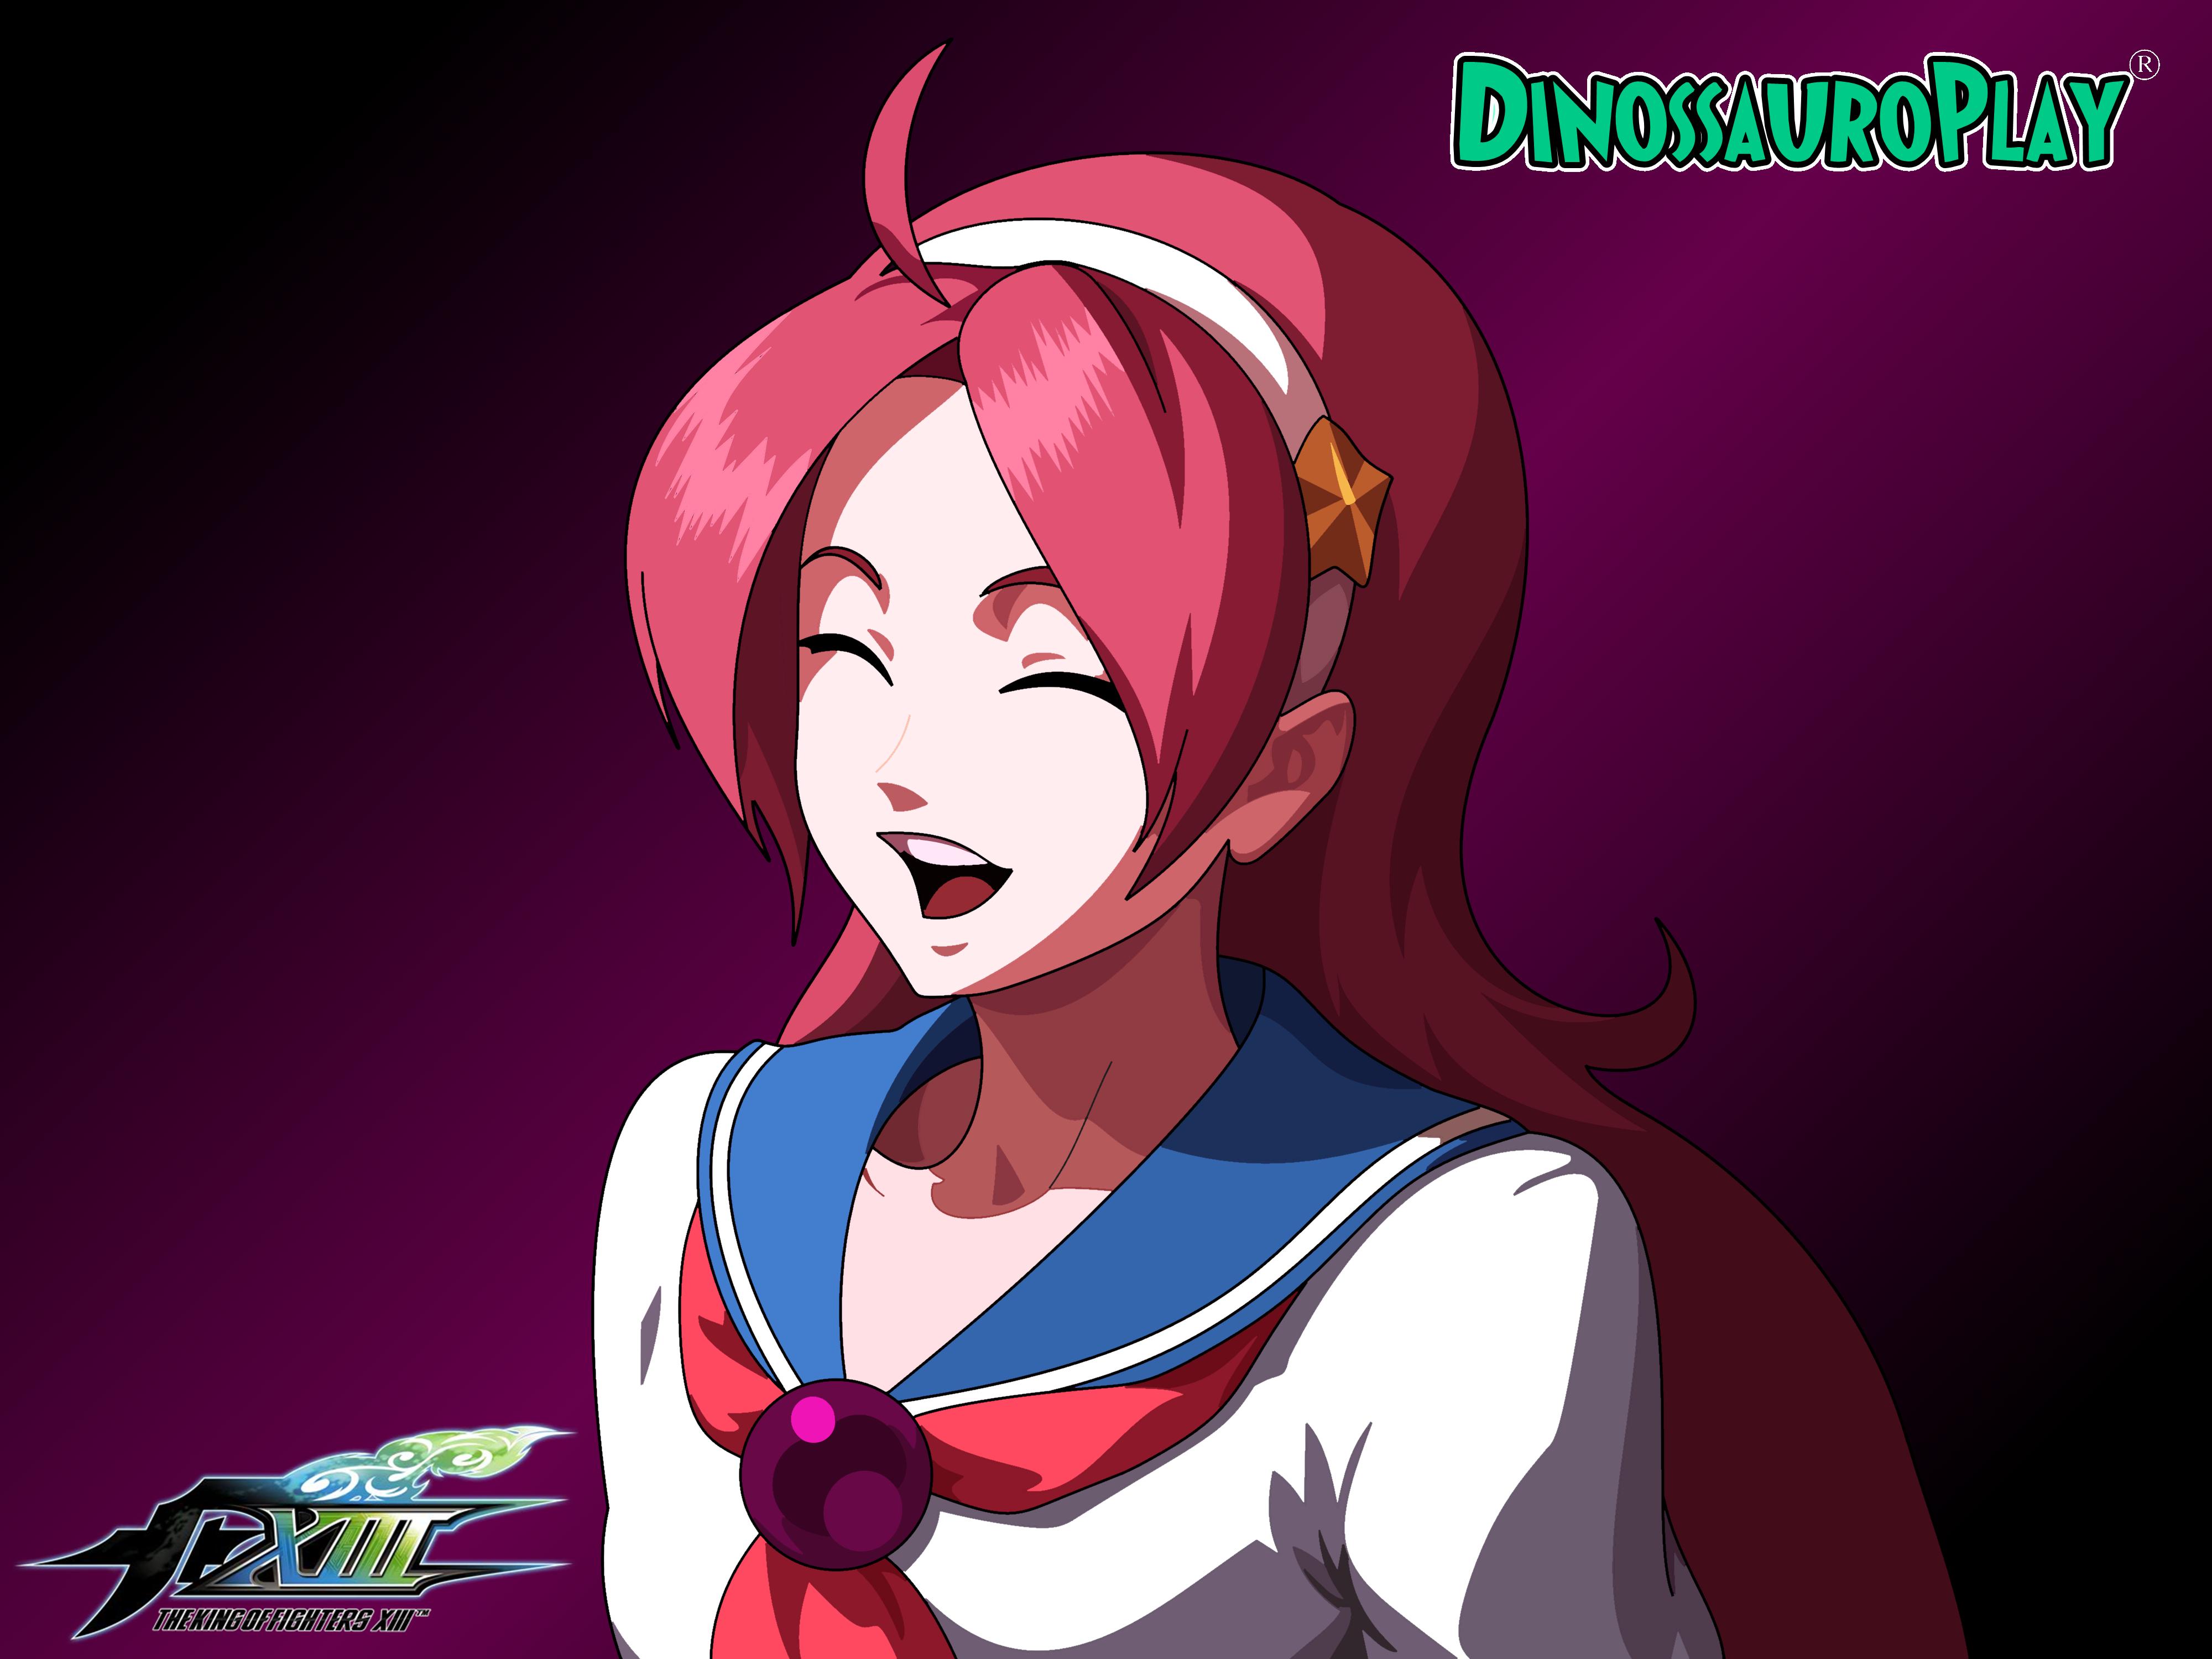 Athena Asamiya Kof Xiii By Dinossauroplay On Deviantart